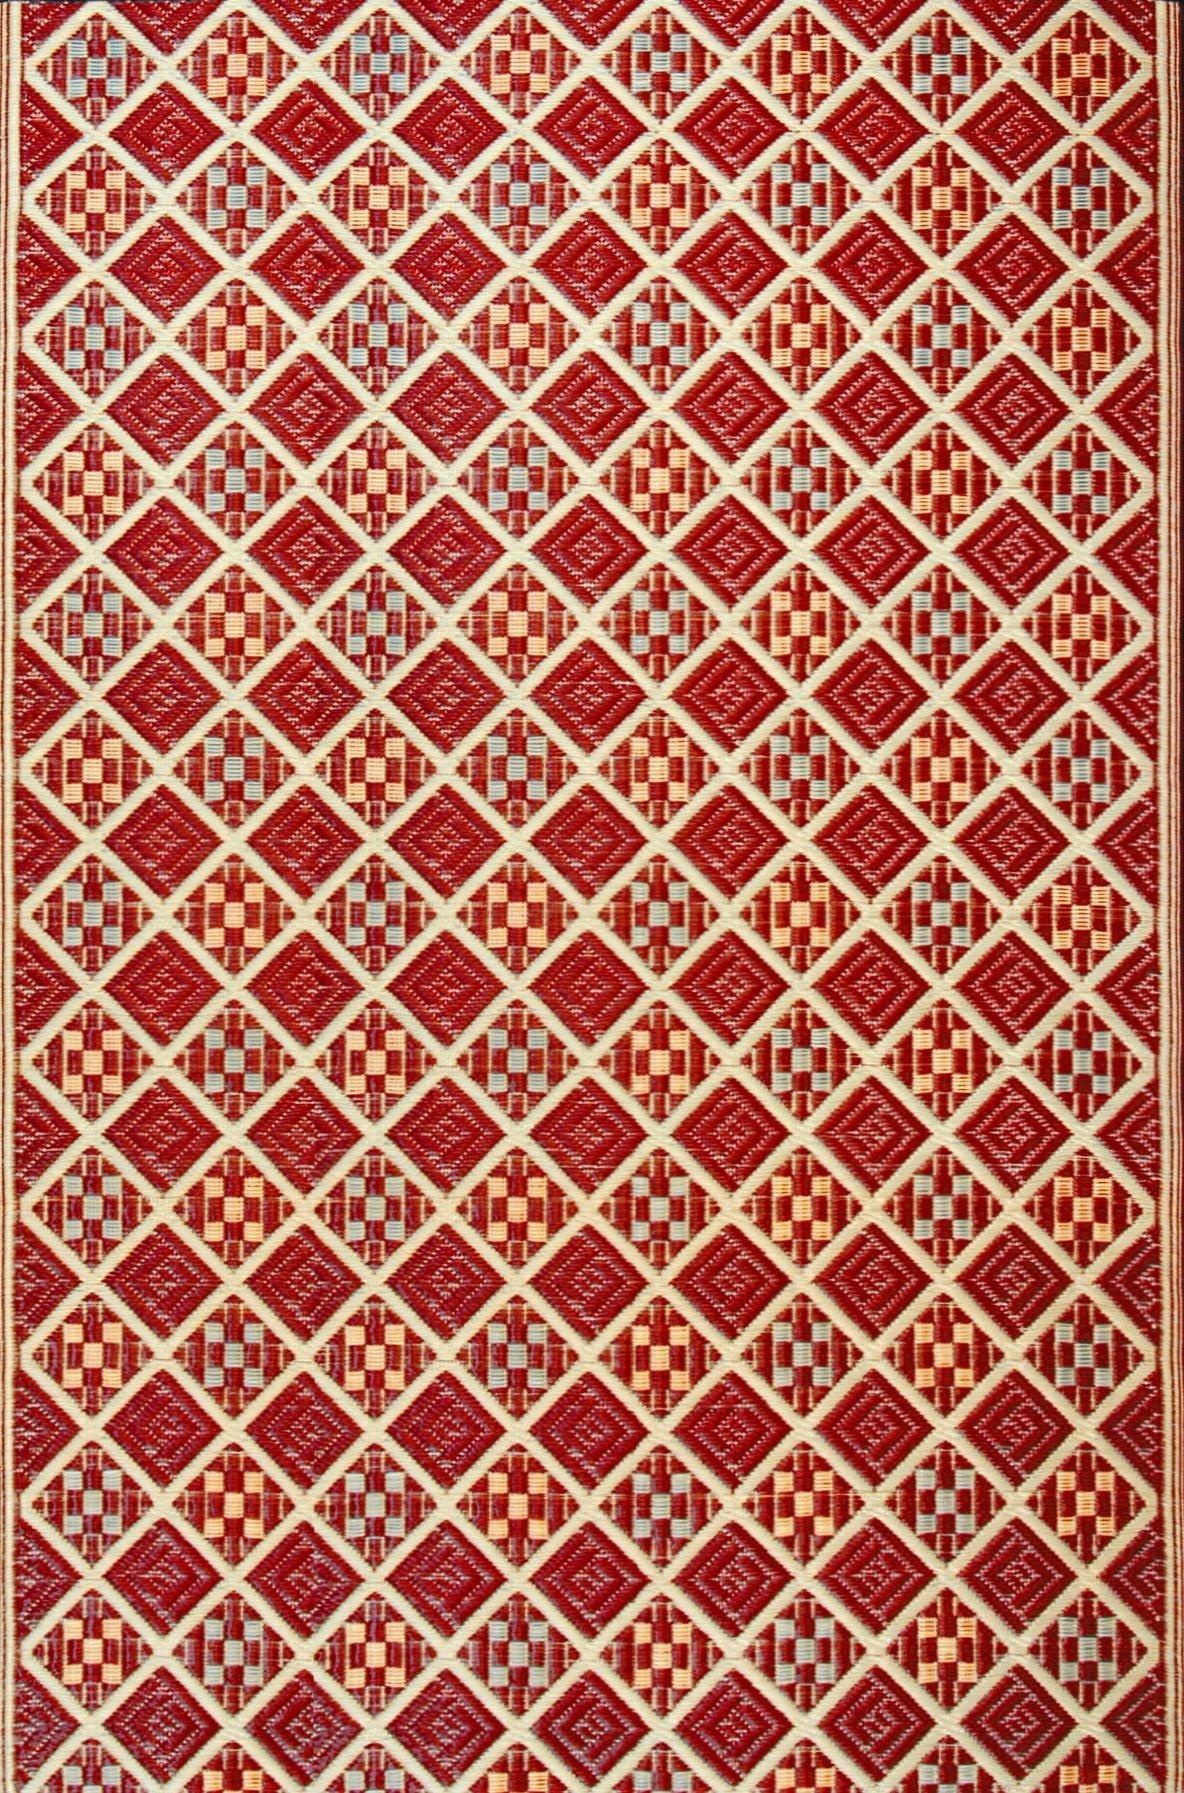 Mad Mats Scotch Indoor/Outdoor Floor Mat, 5 by 8-Feet, Cranberry